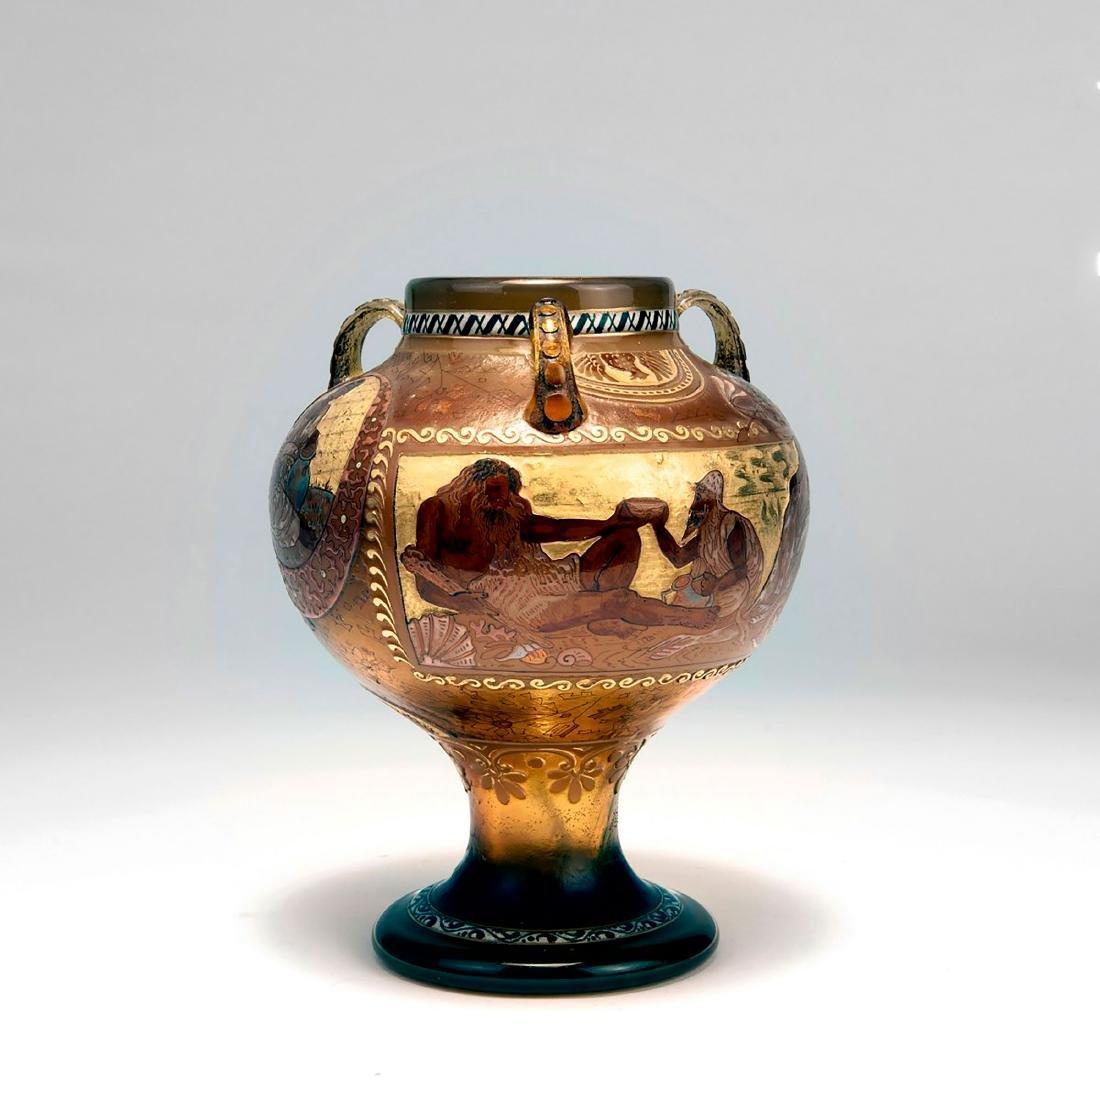 'Echoes of Hellas' vase with handles, 1895-1900